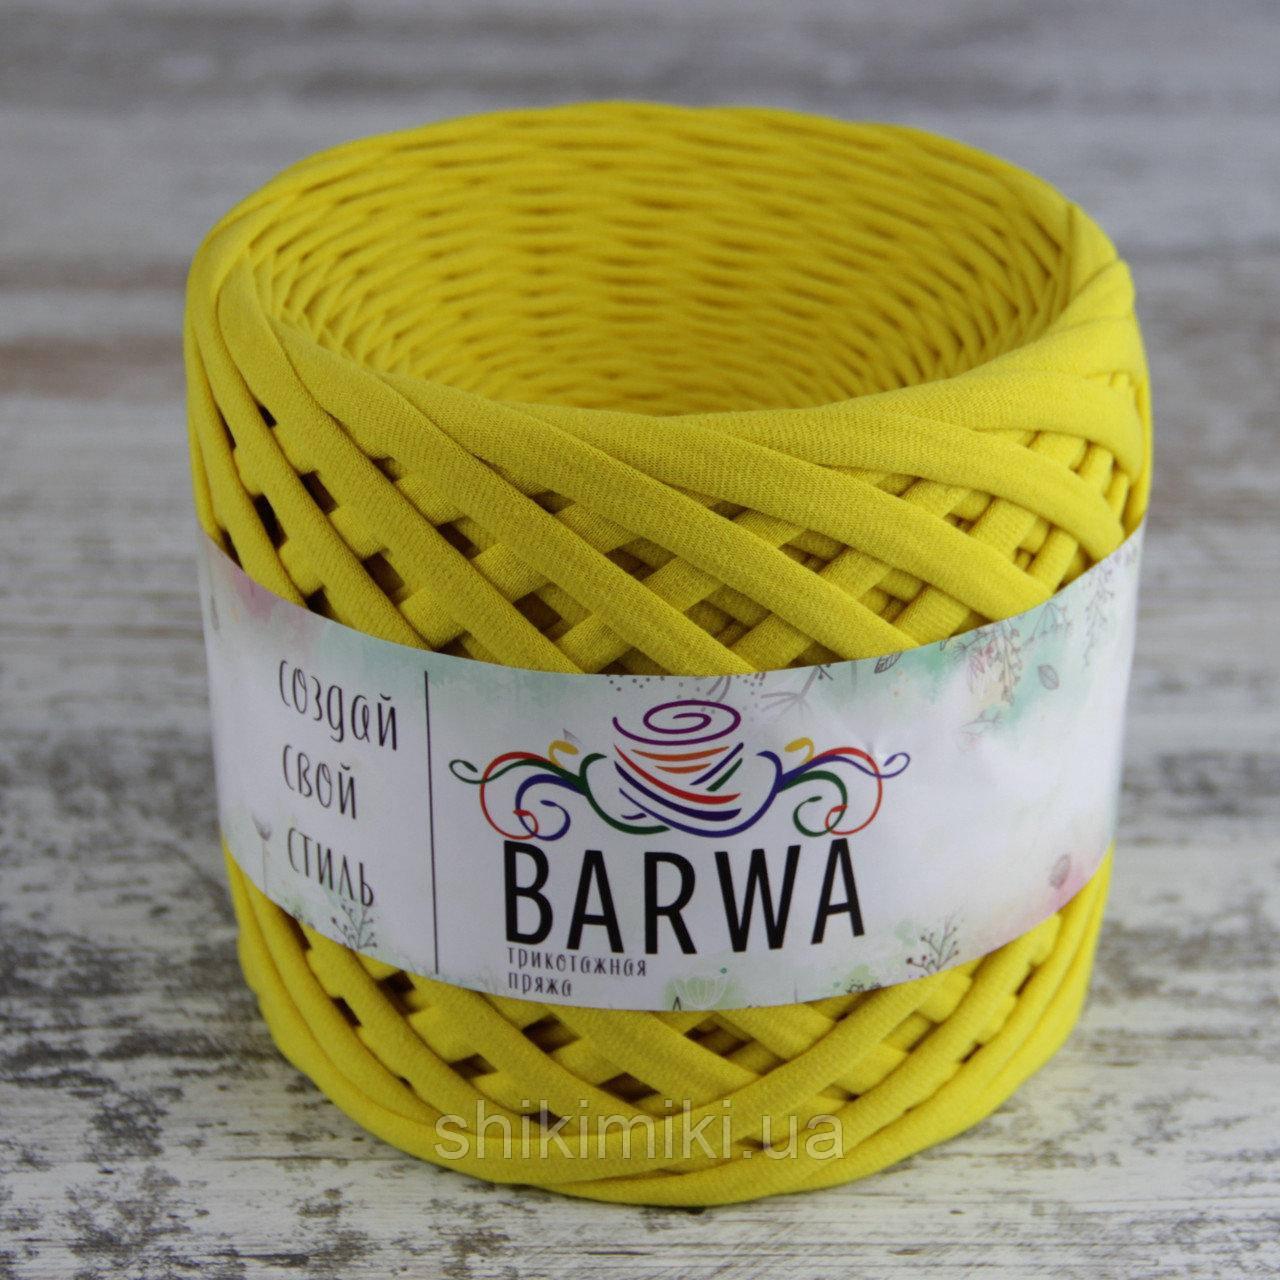 Трикотажная пряжа Barwa (7-9 мм), цвет Одуванчик